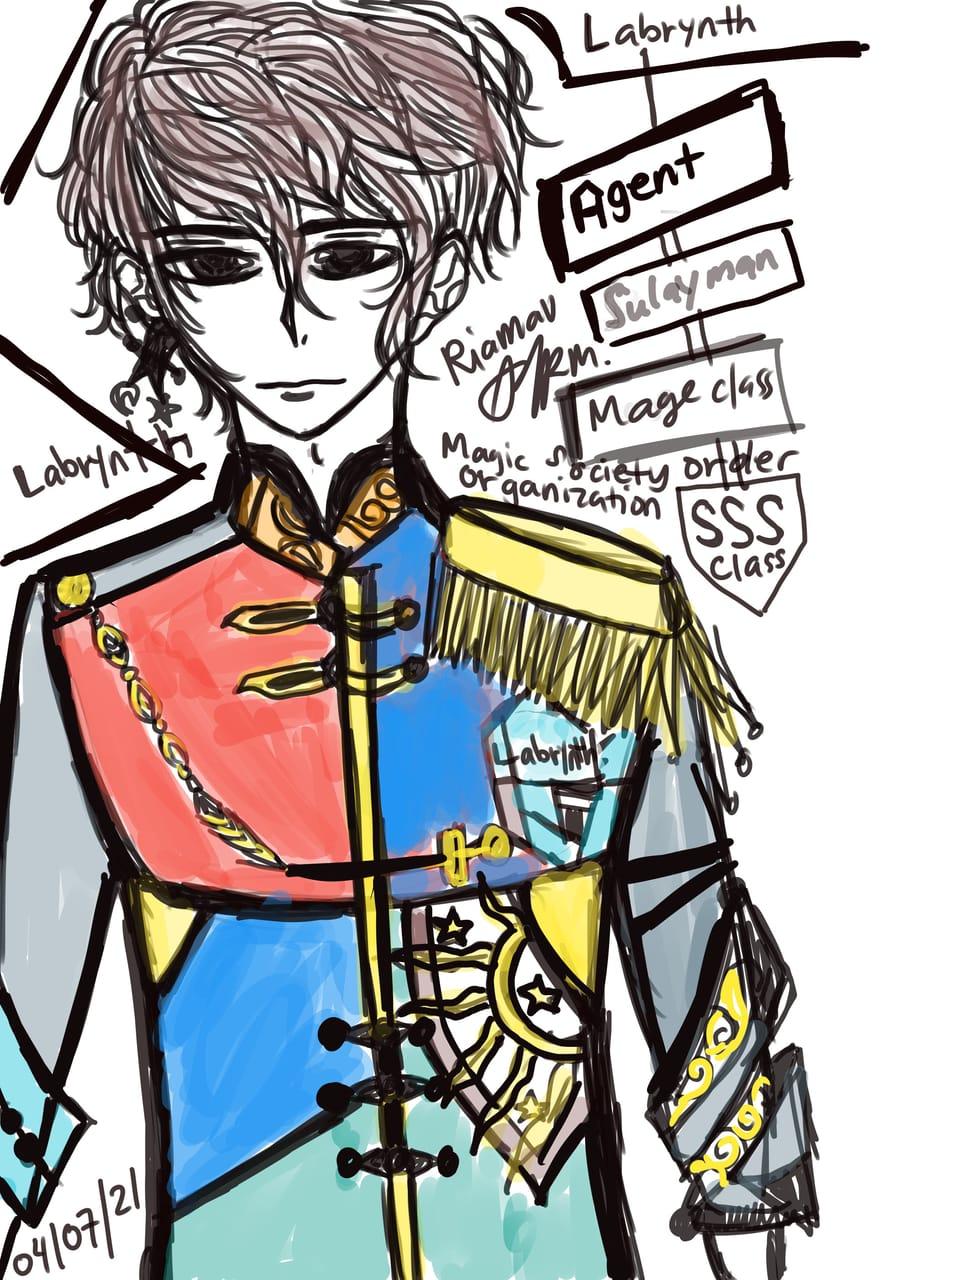 ① Labrynthsecret magic order organization  Illust of RiaMAV MySecretSocietyContest